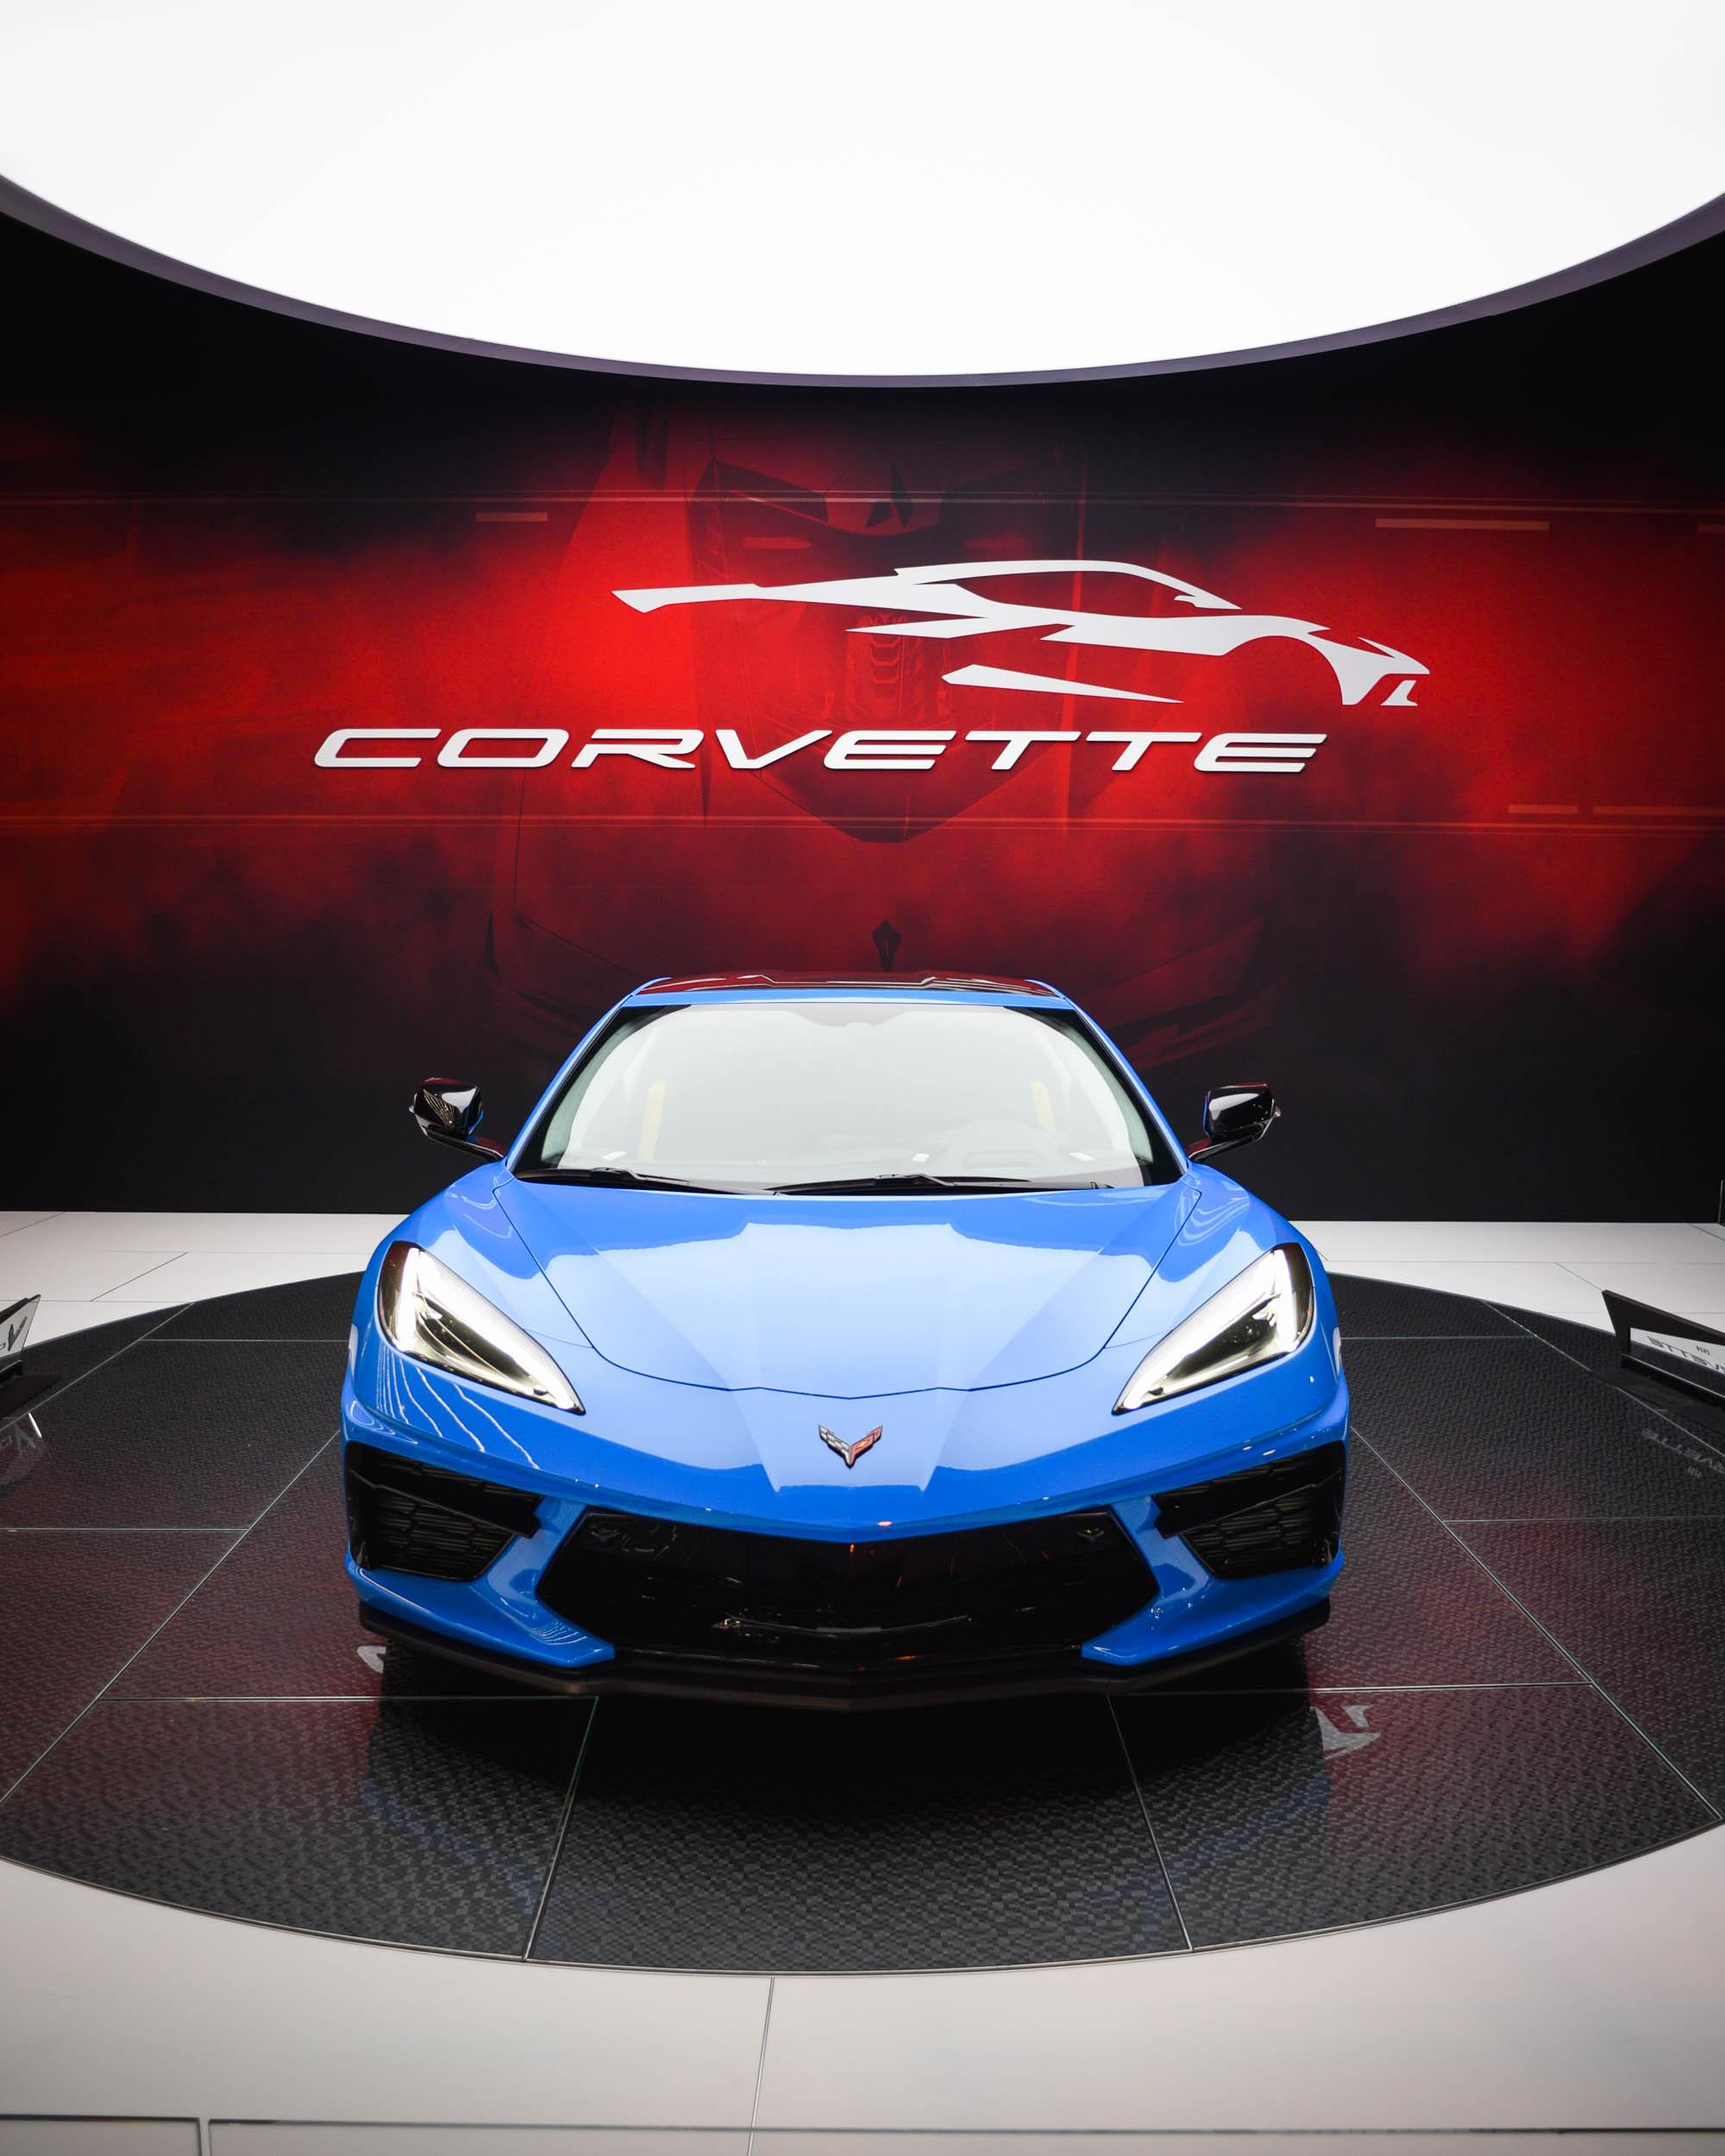 2020 Corvette C8 Chicago Auto Show